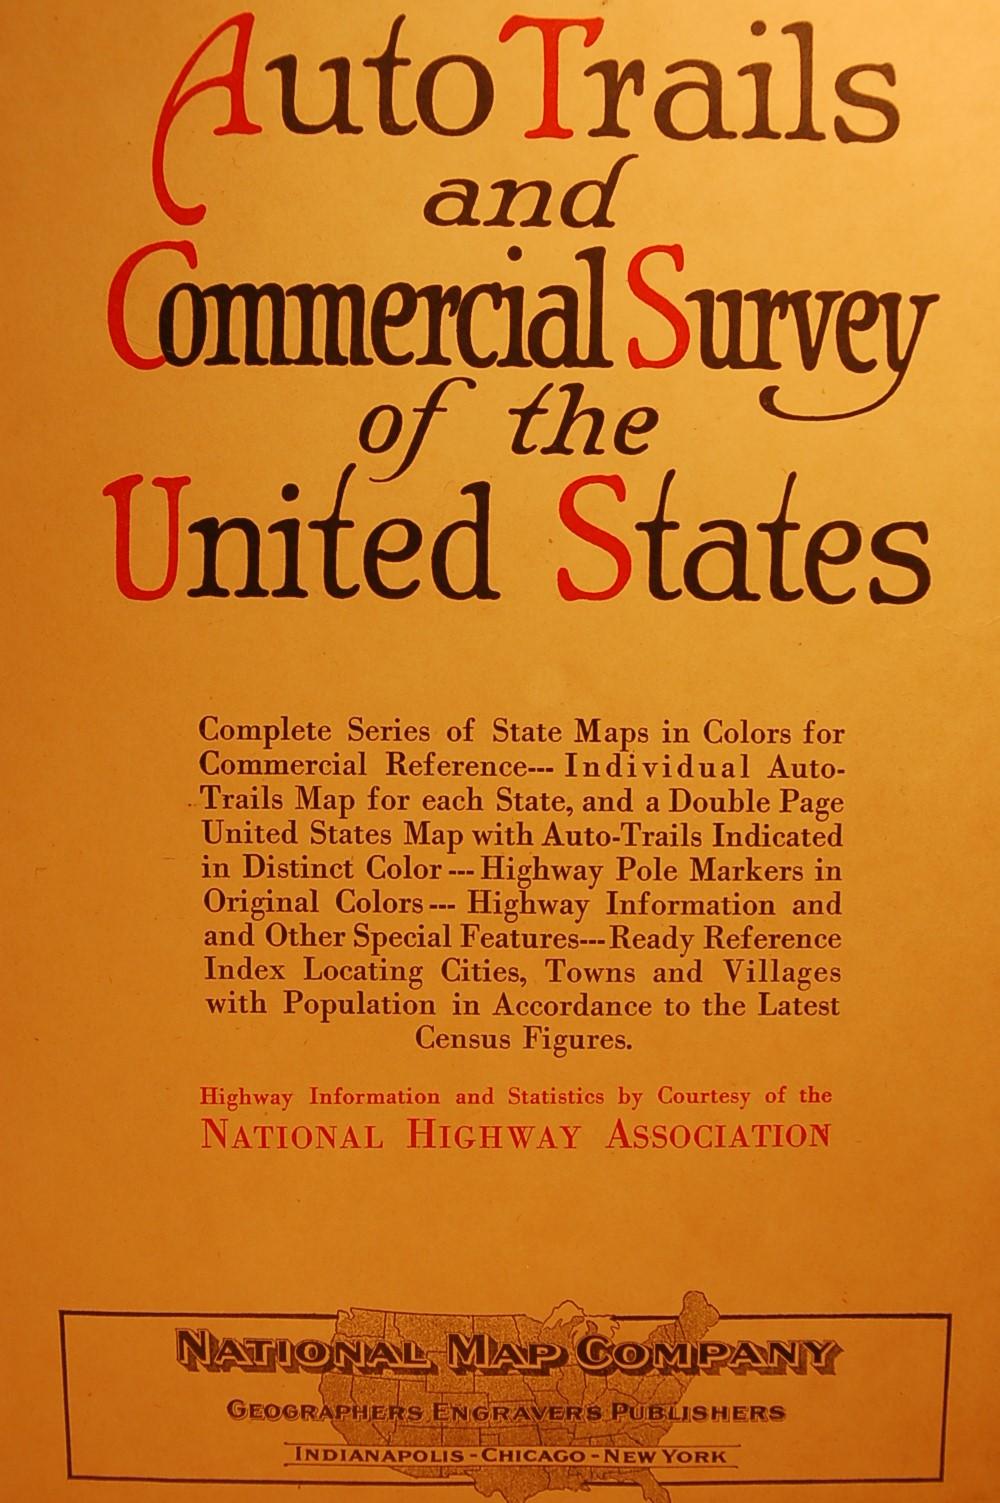 pre 1926 road atlas left post 1926 atlas with us hwy designations right